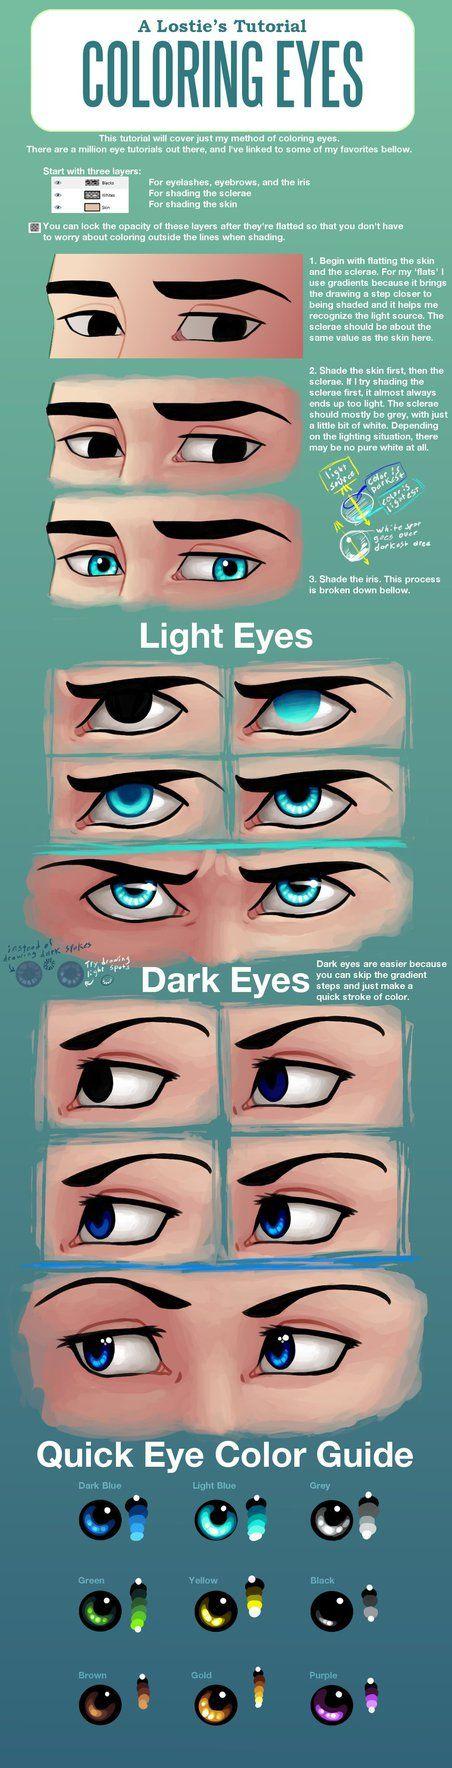 A Lostie's Tutorial - Coloring Eyes by lostie815